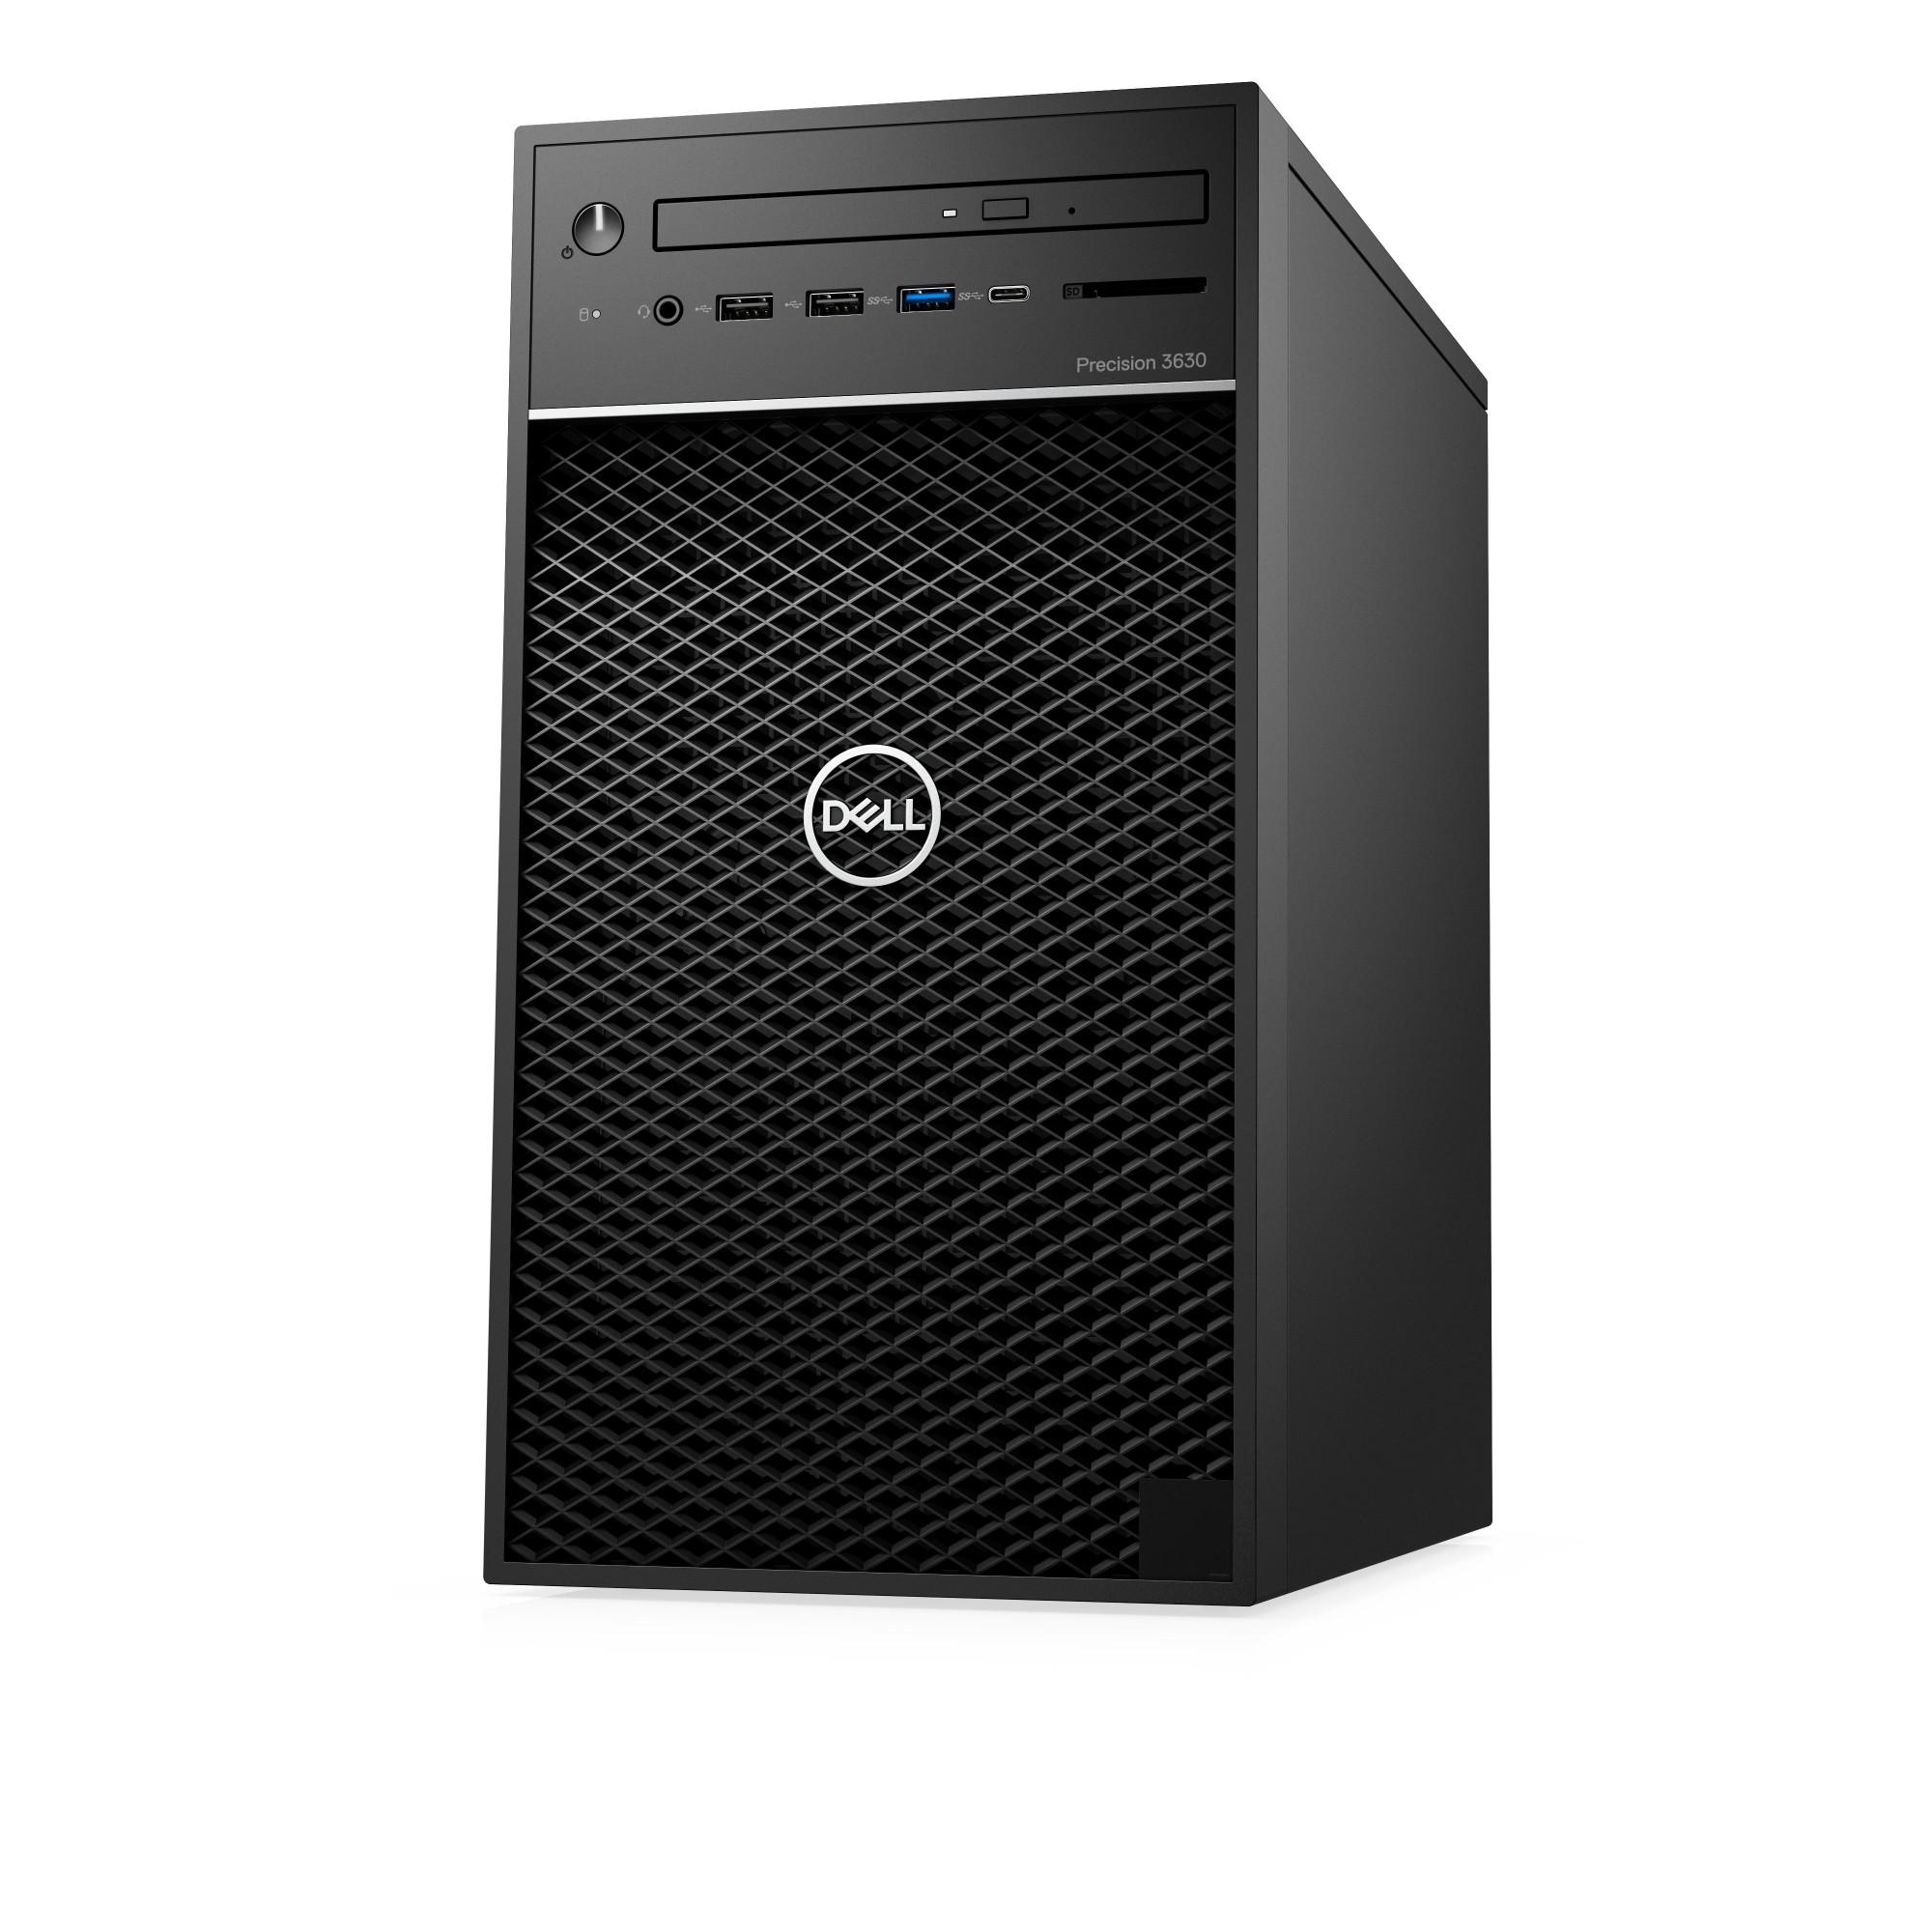 DELL Precision T3630 8th gen Intel® Core™ i7 i7-8700 8 GB DDR4-SDRAM 1000  GB HDD Black Tower Workstation